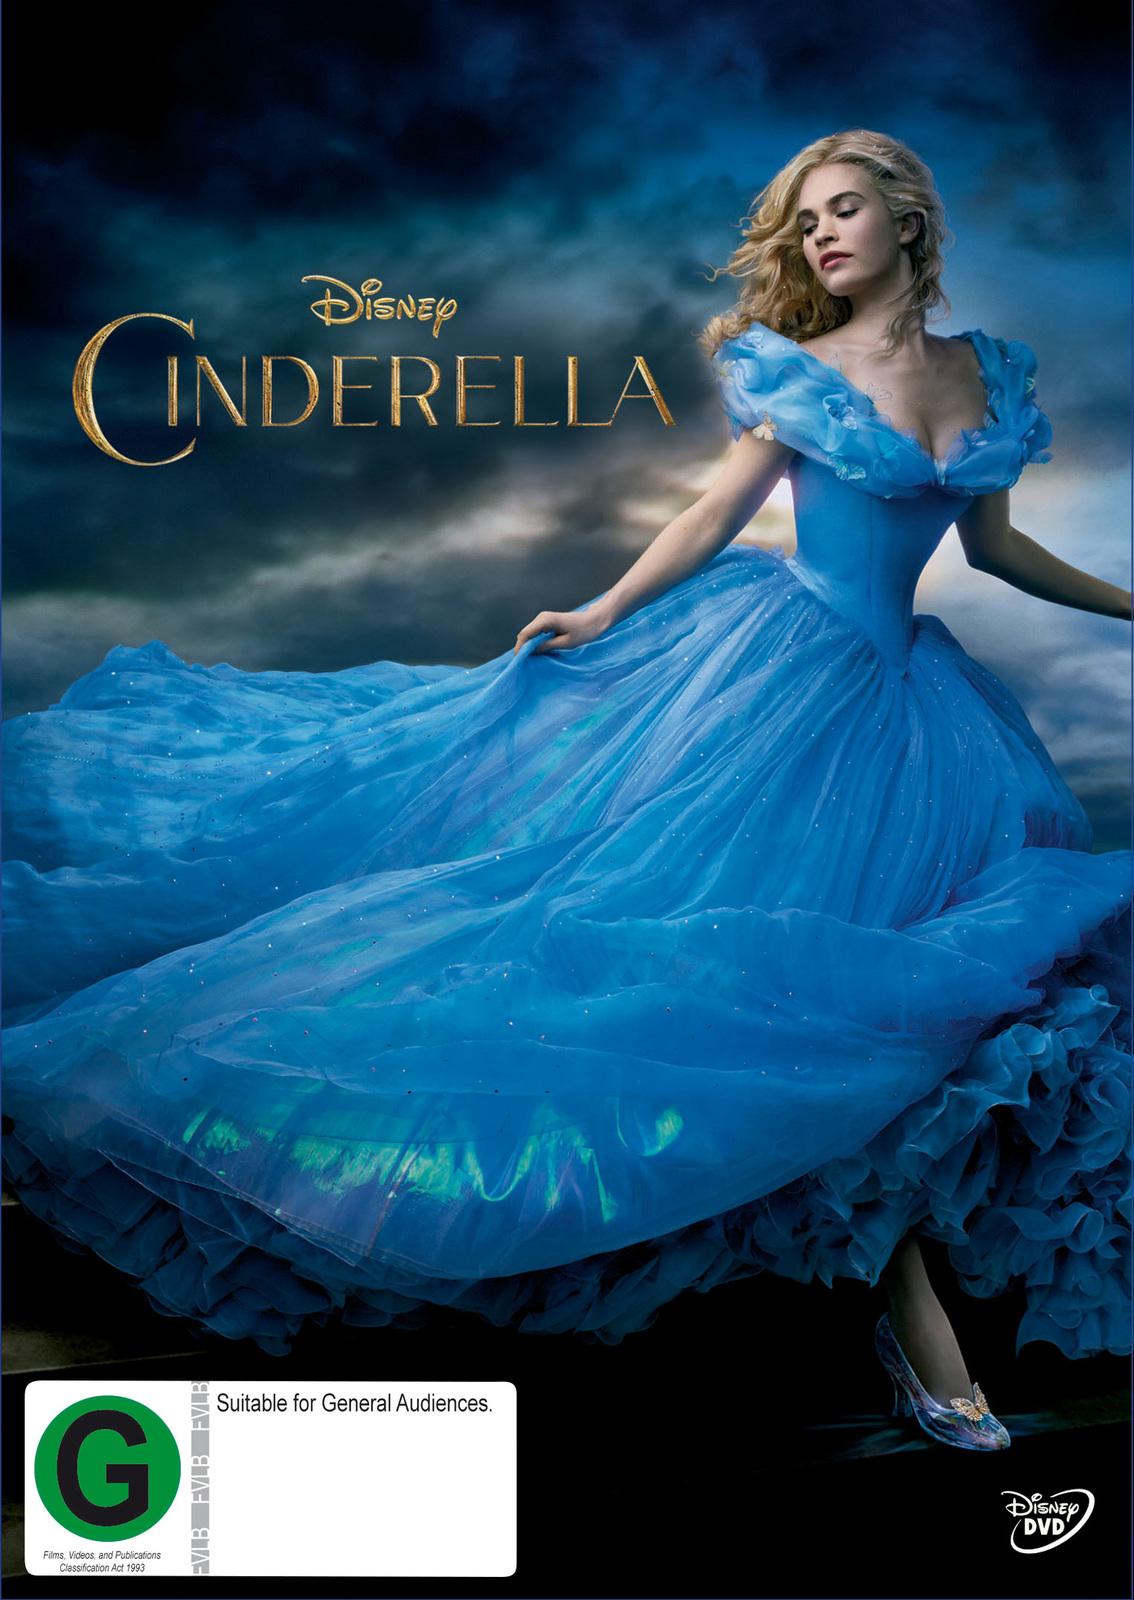 Cinderella (2015) on DVD image